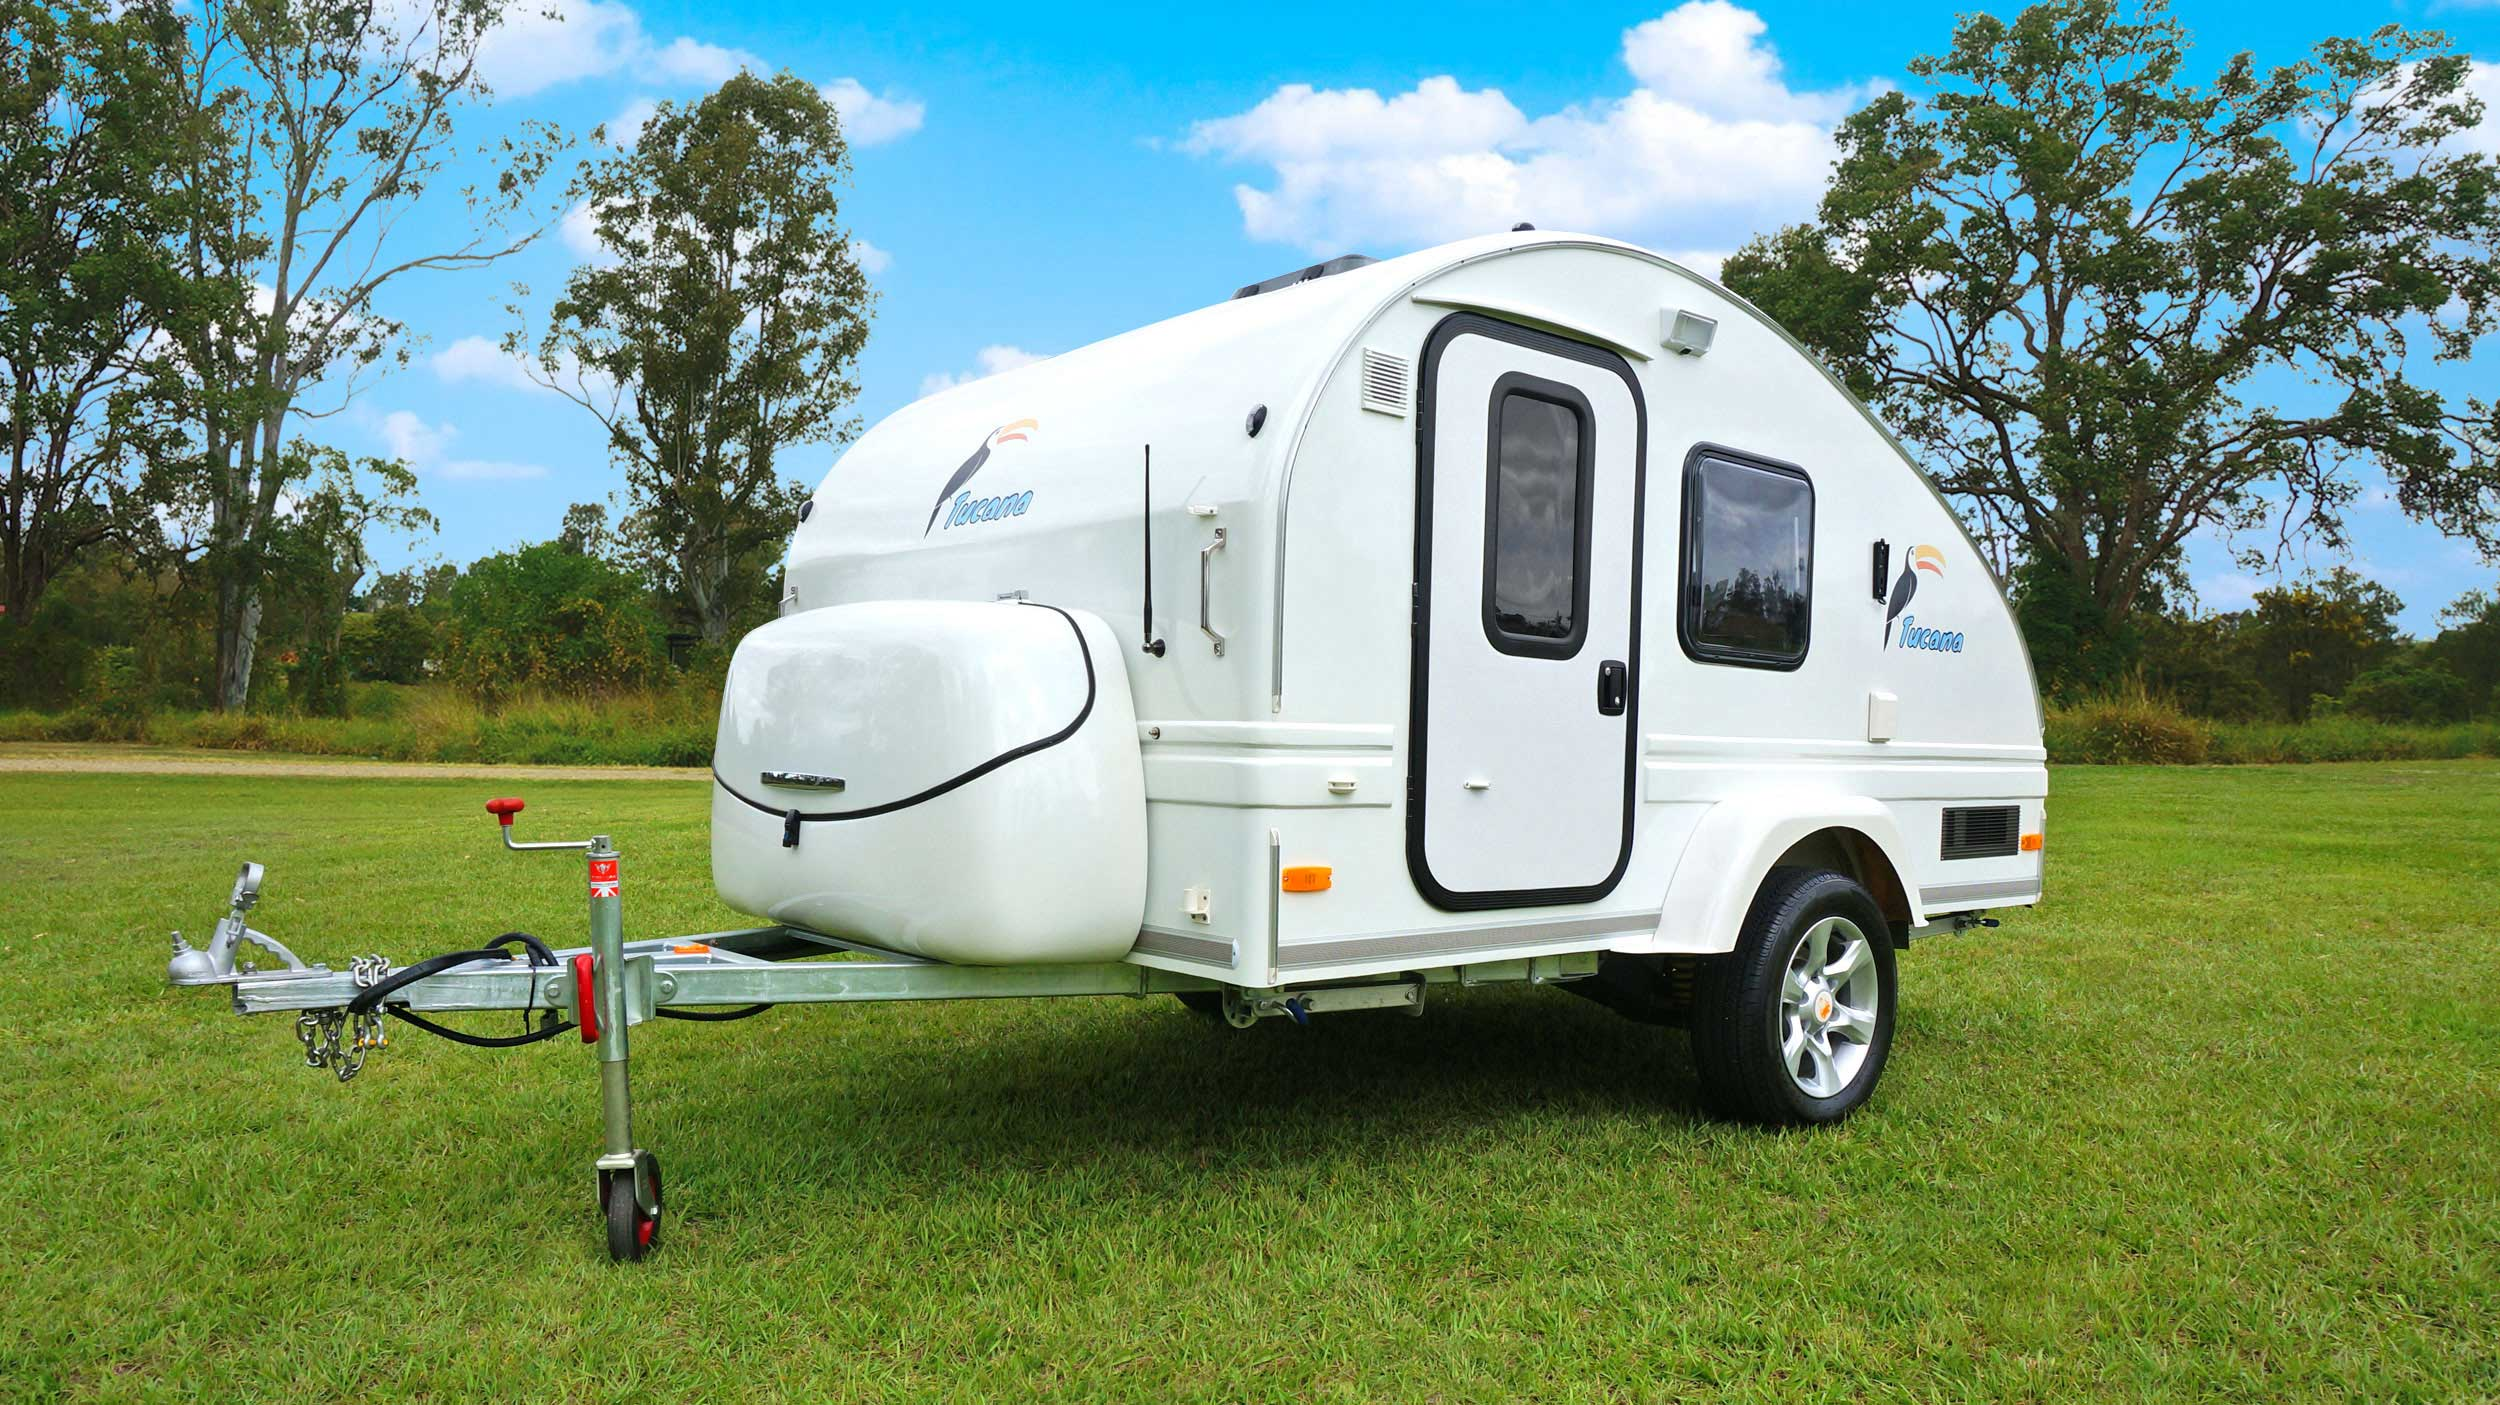 Tucana Teardrop Camper Ultra Light Weight Trailer Large